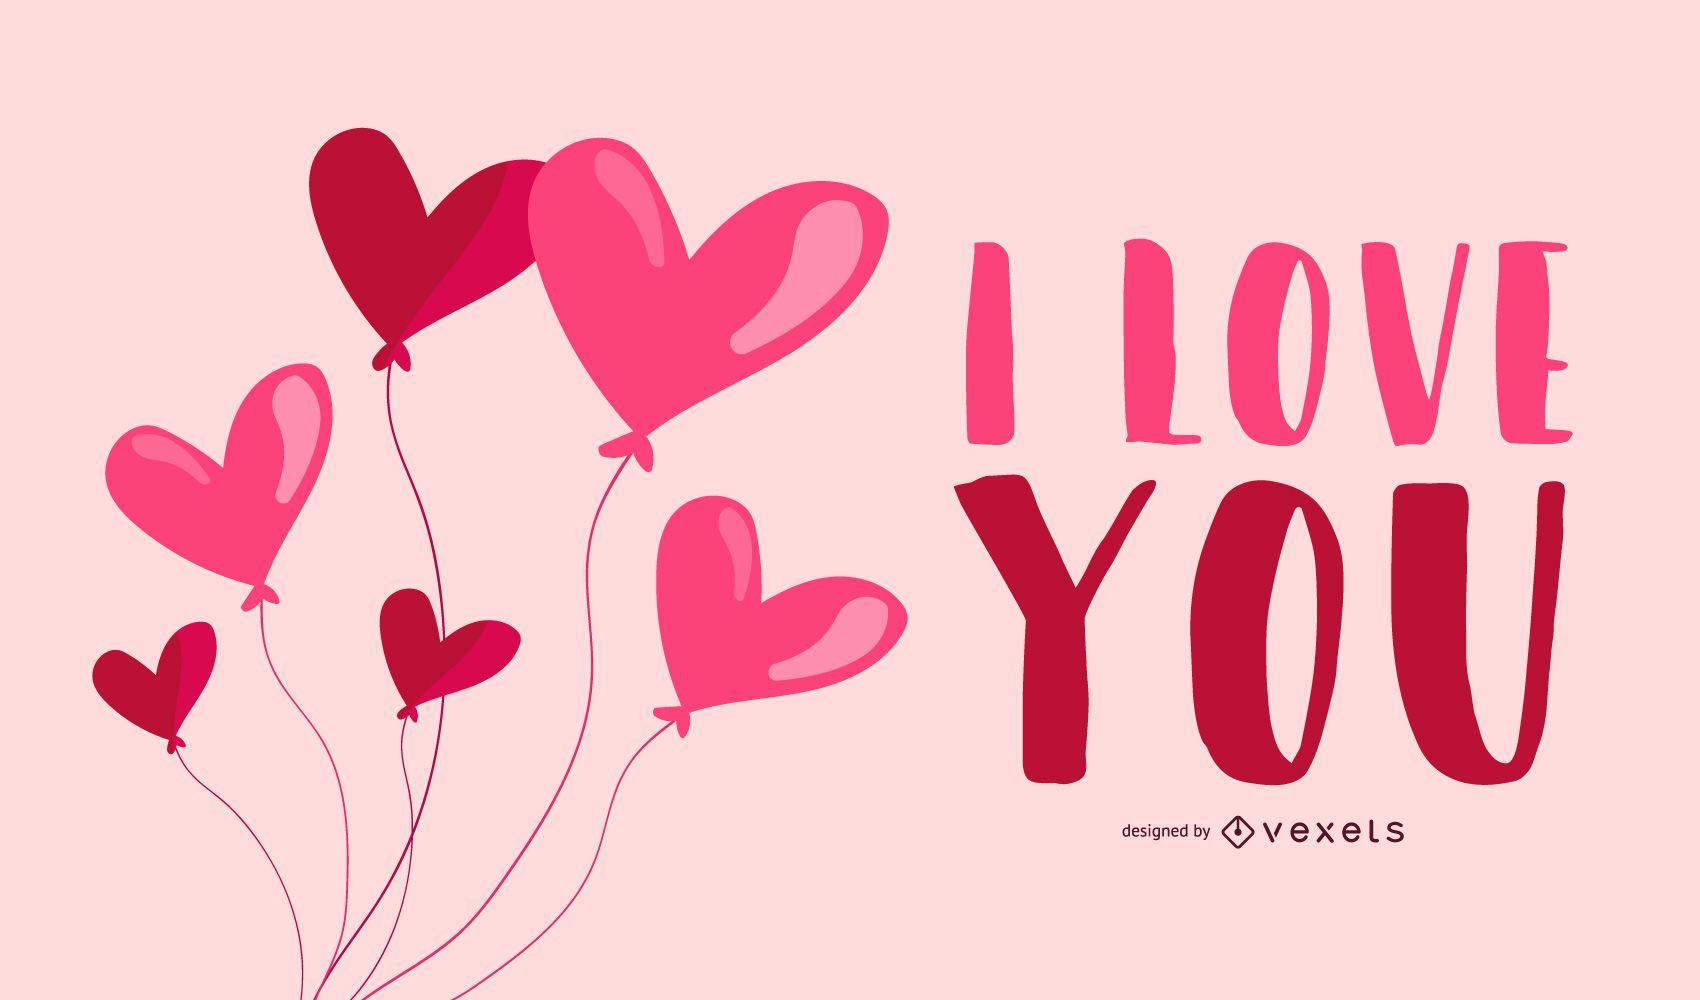 Simplistic Heart Balloons Valentine Card